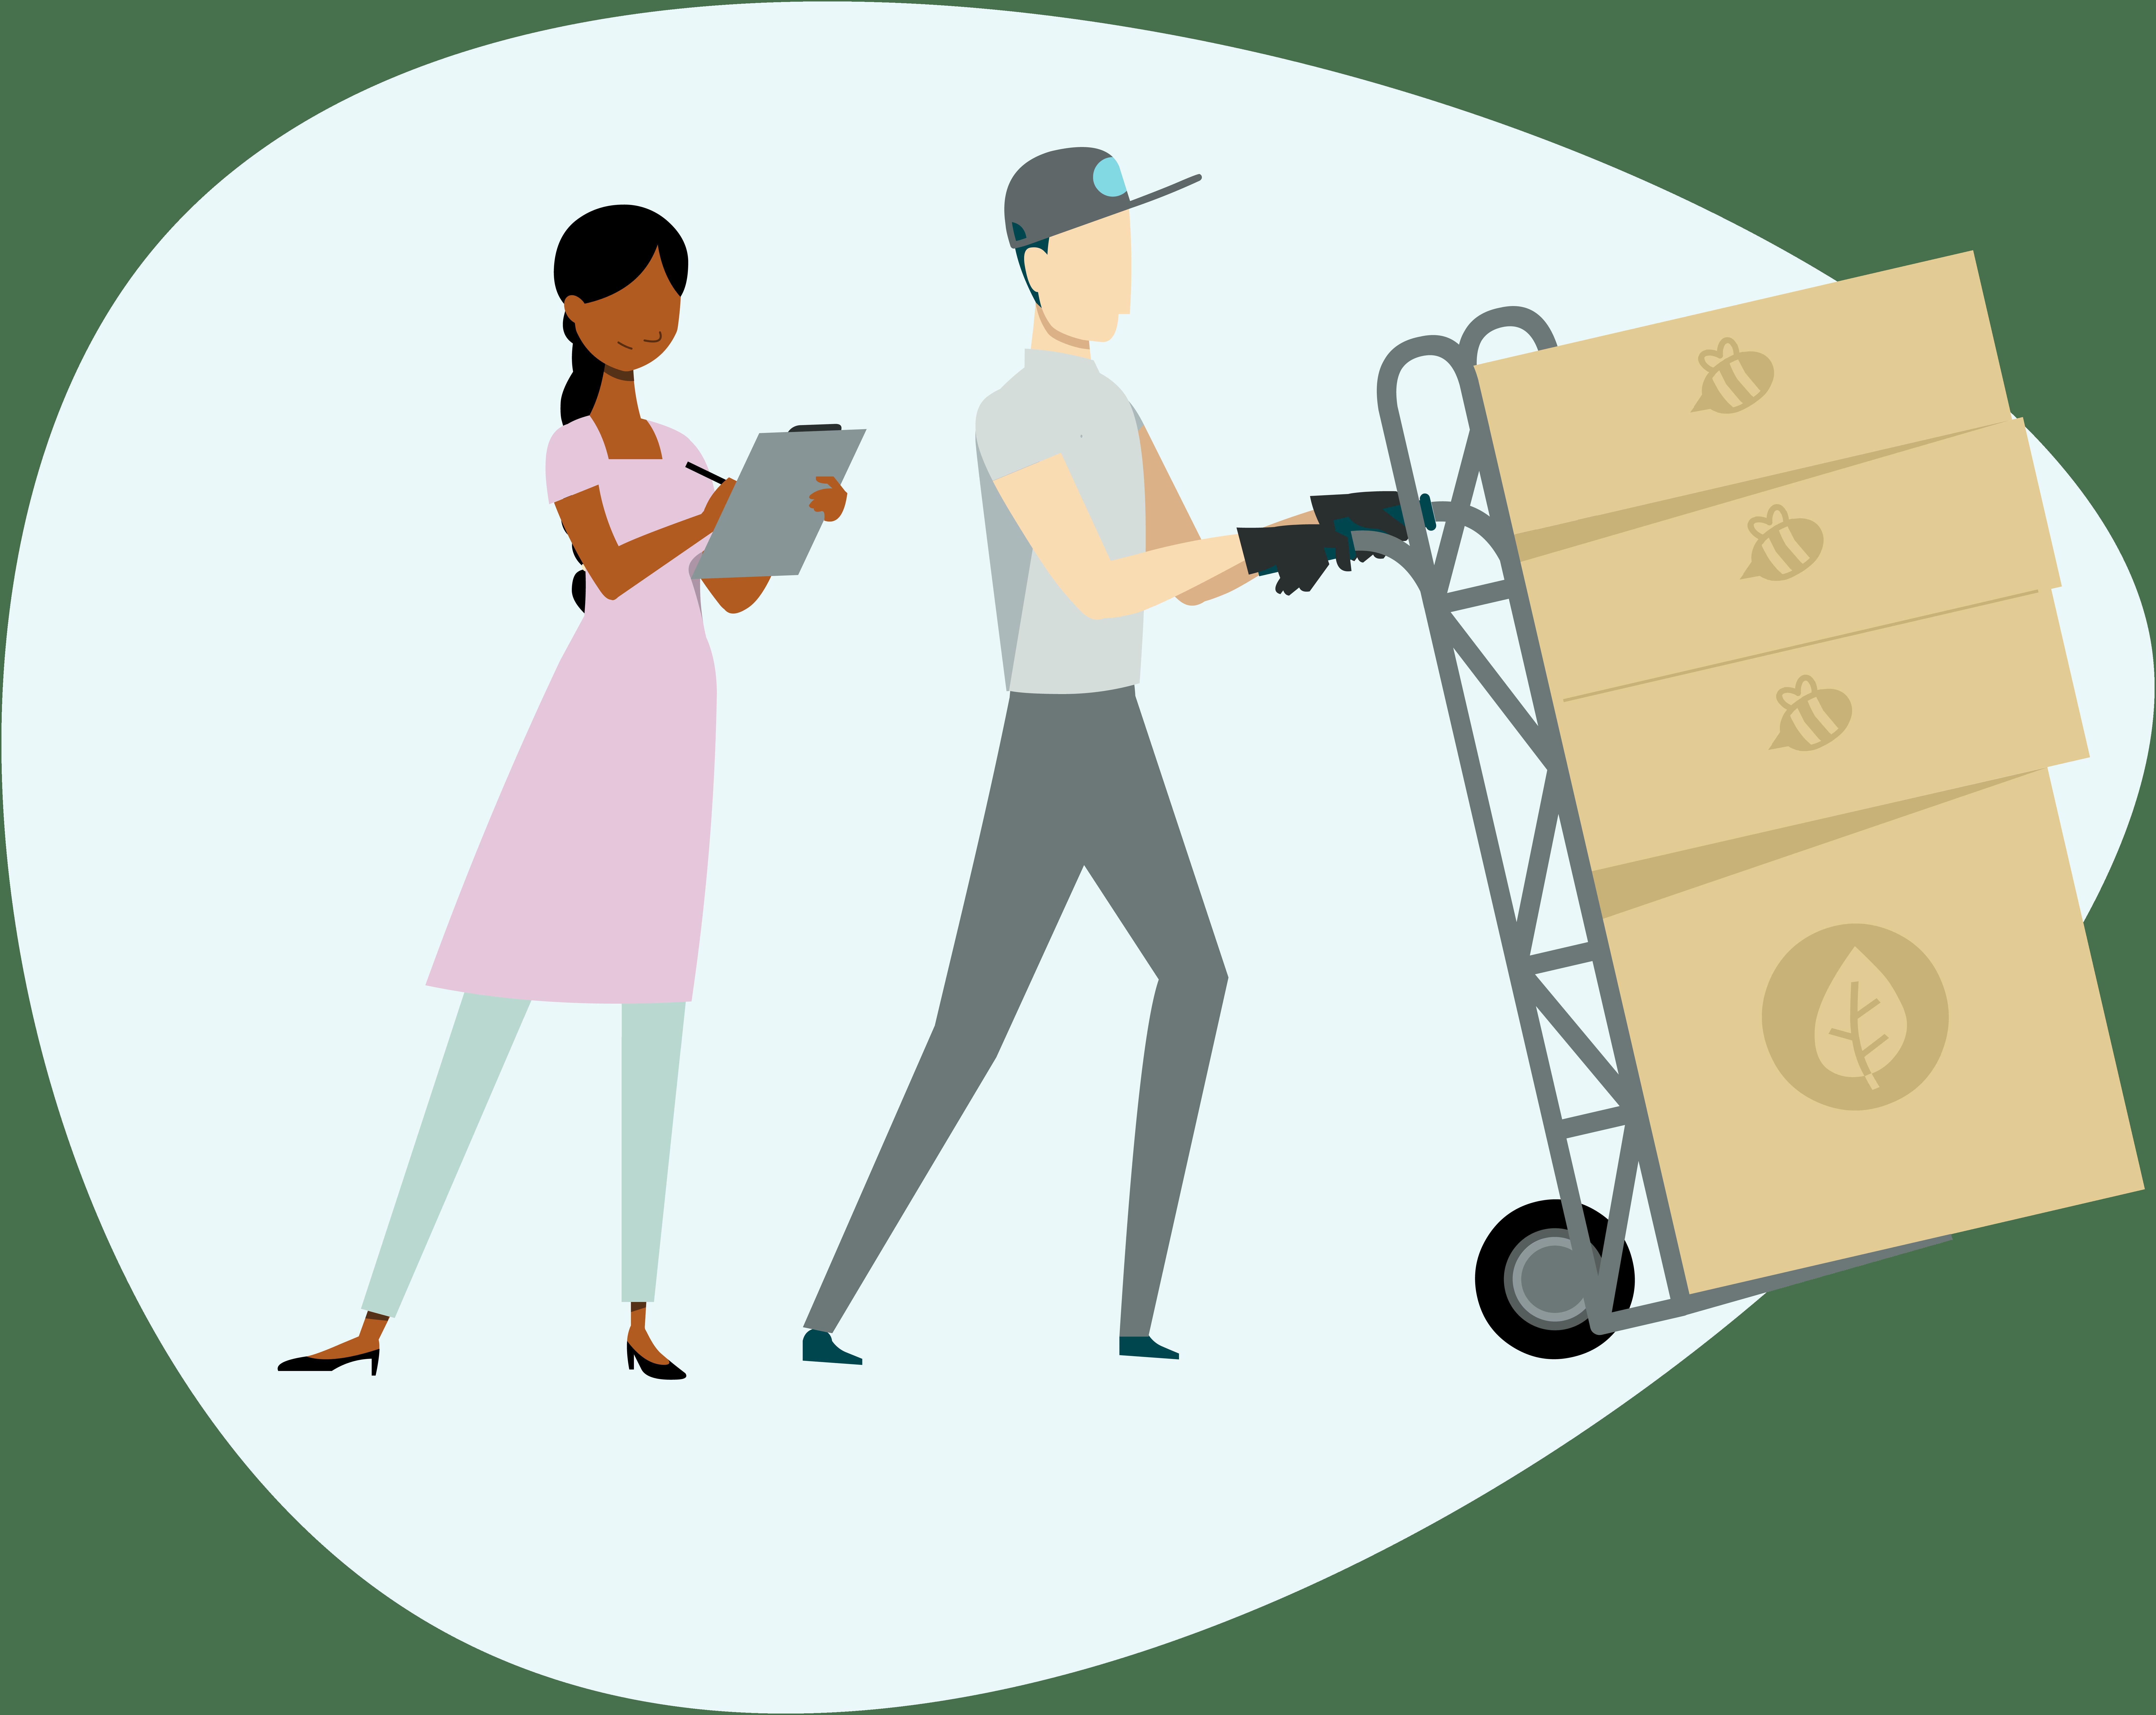 FBAパートナーキャリア・ヤマトオプション 割引プロモーション